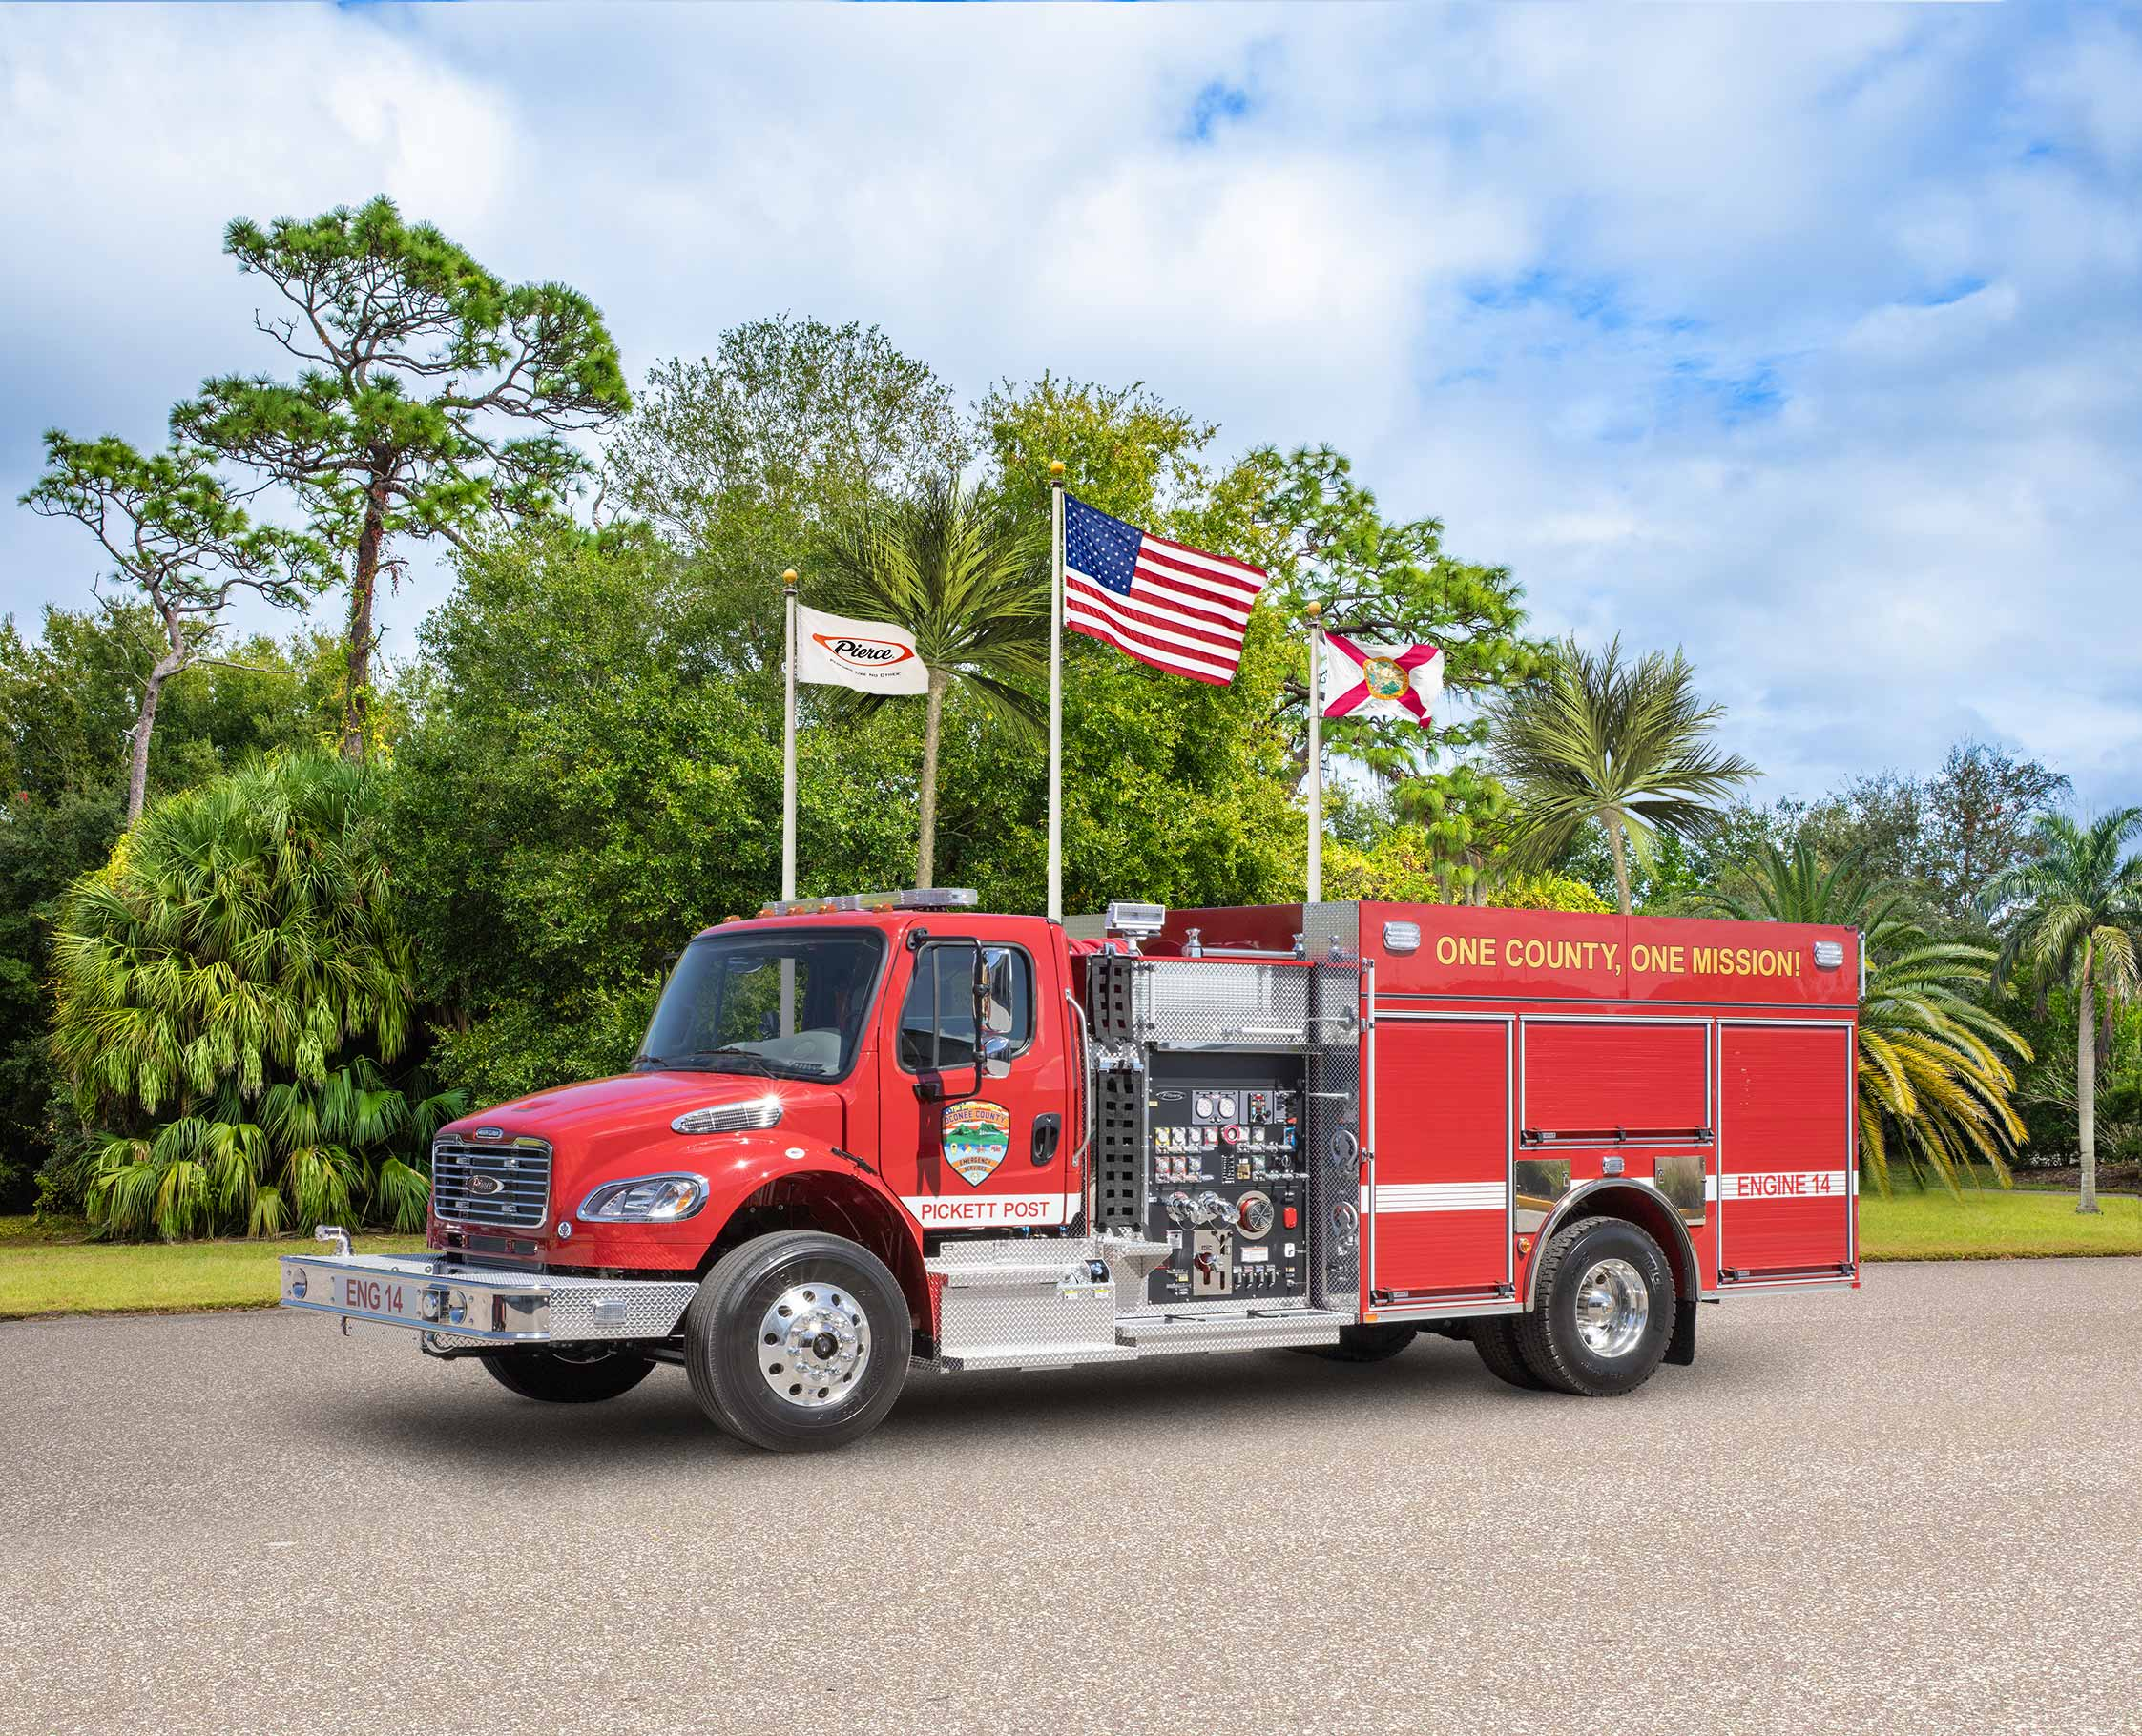 Oconee County Emergency Services - Pumper